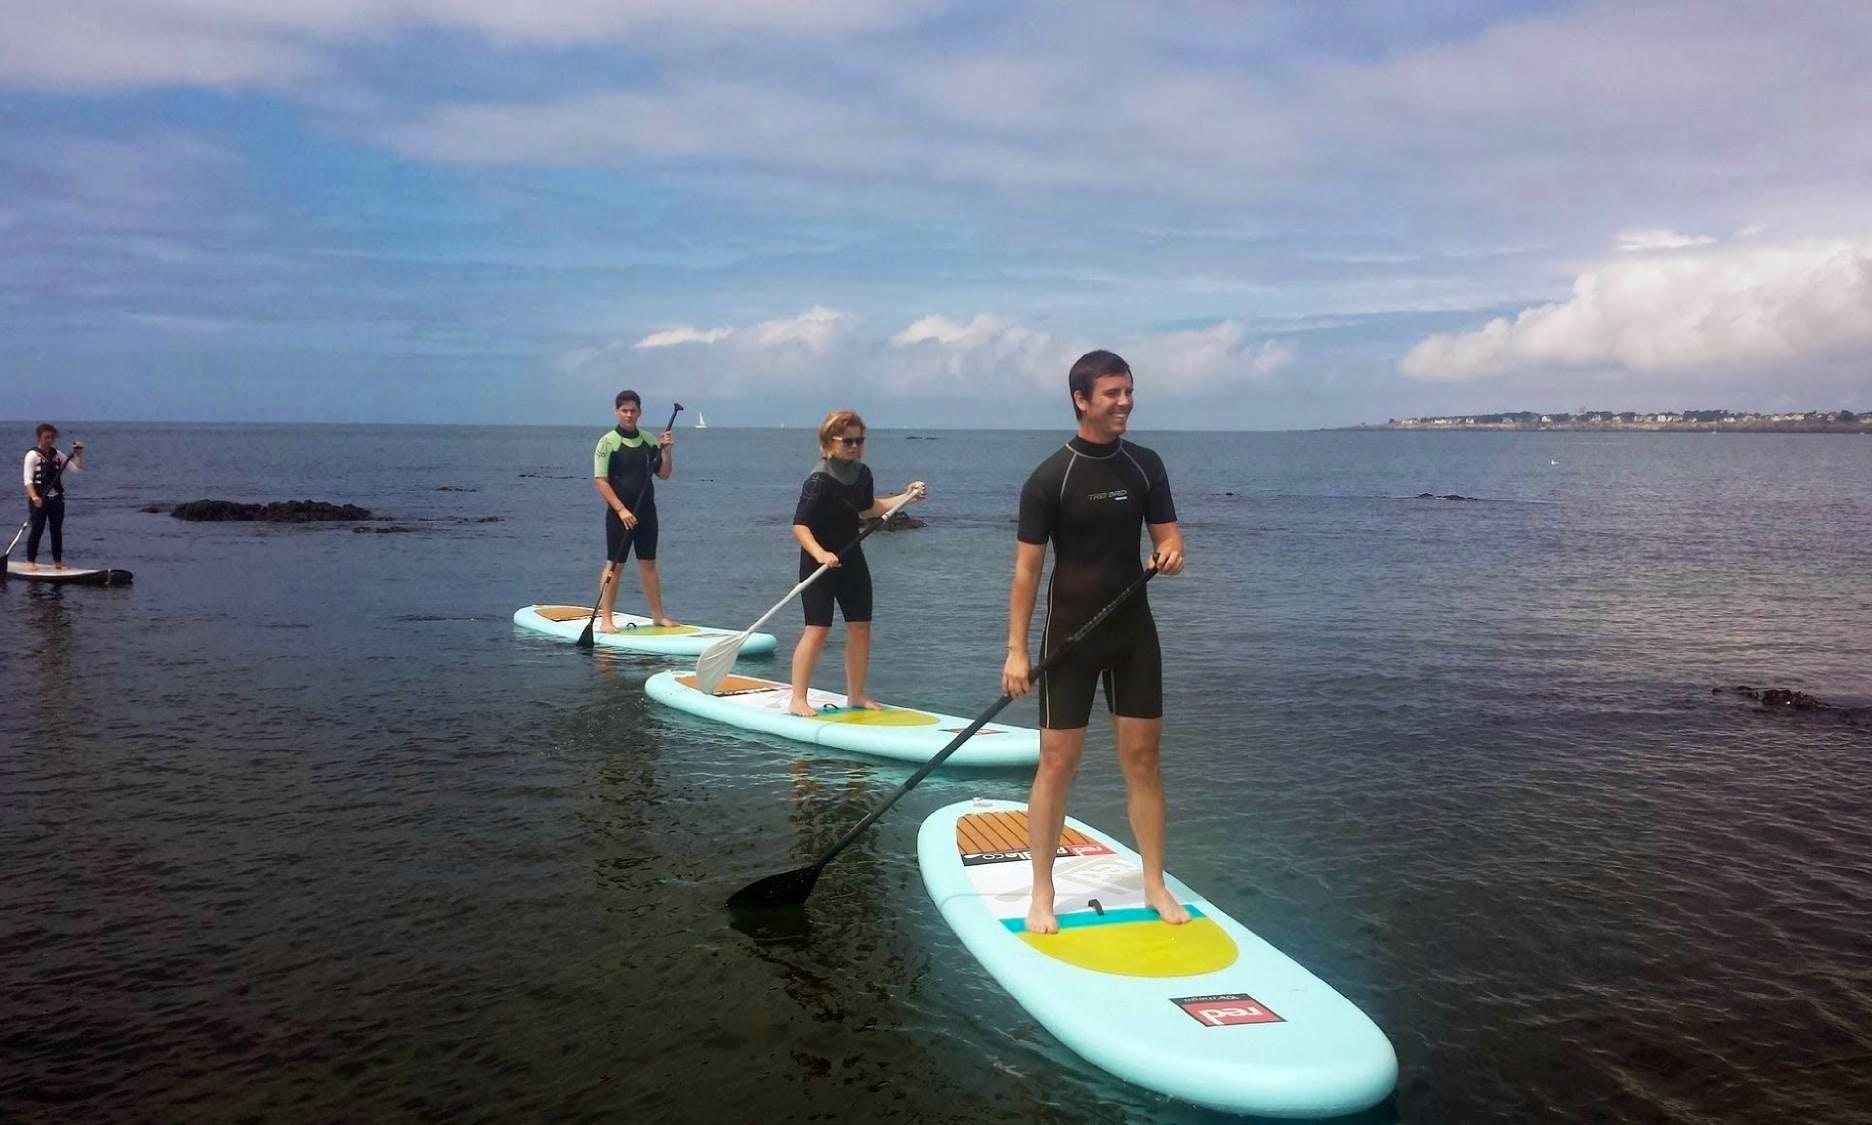 Enjoy Stand UP Paddleboarding in Pornichet, Pays de la Loire